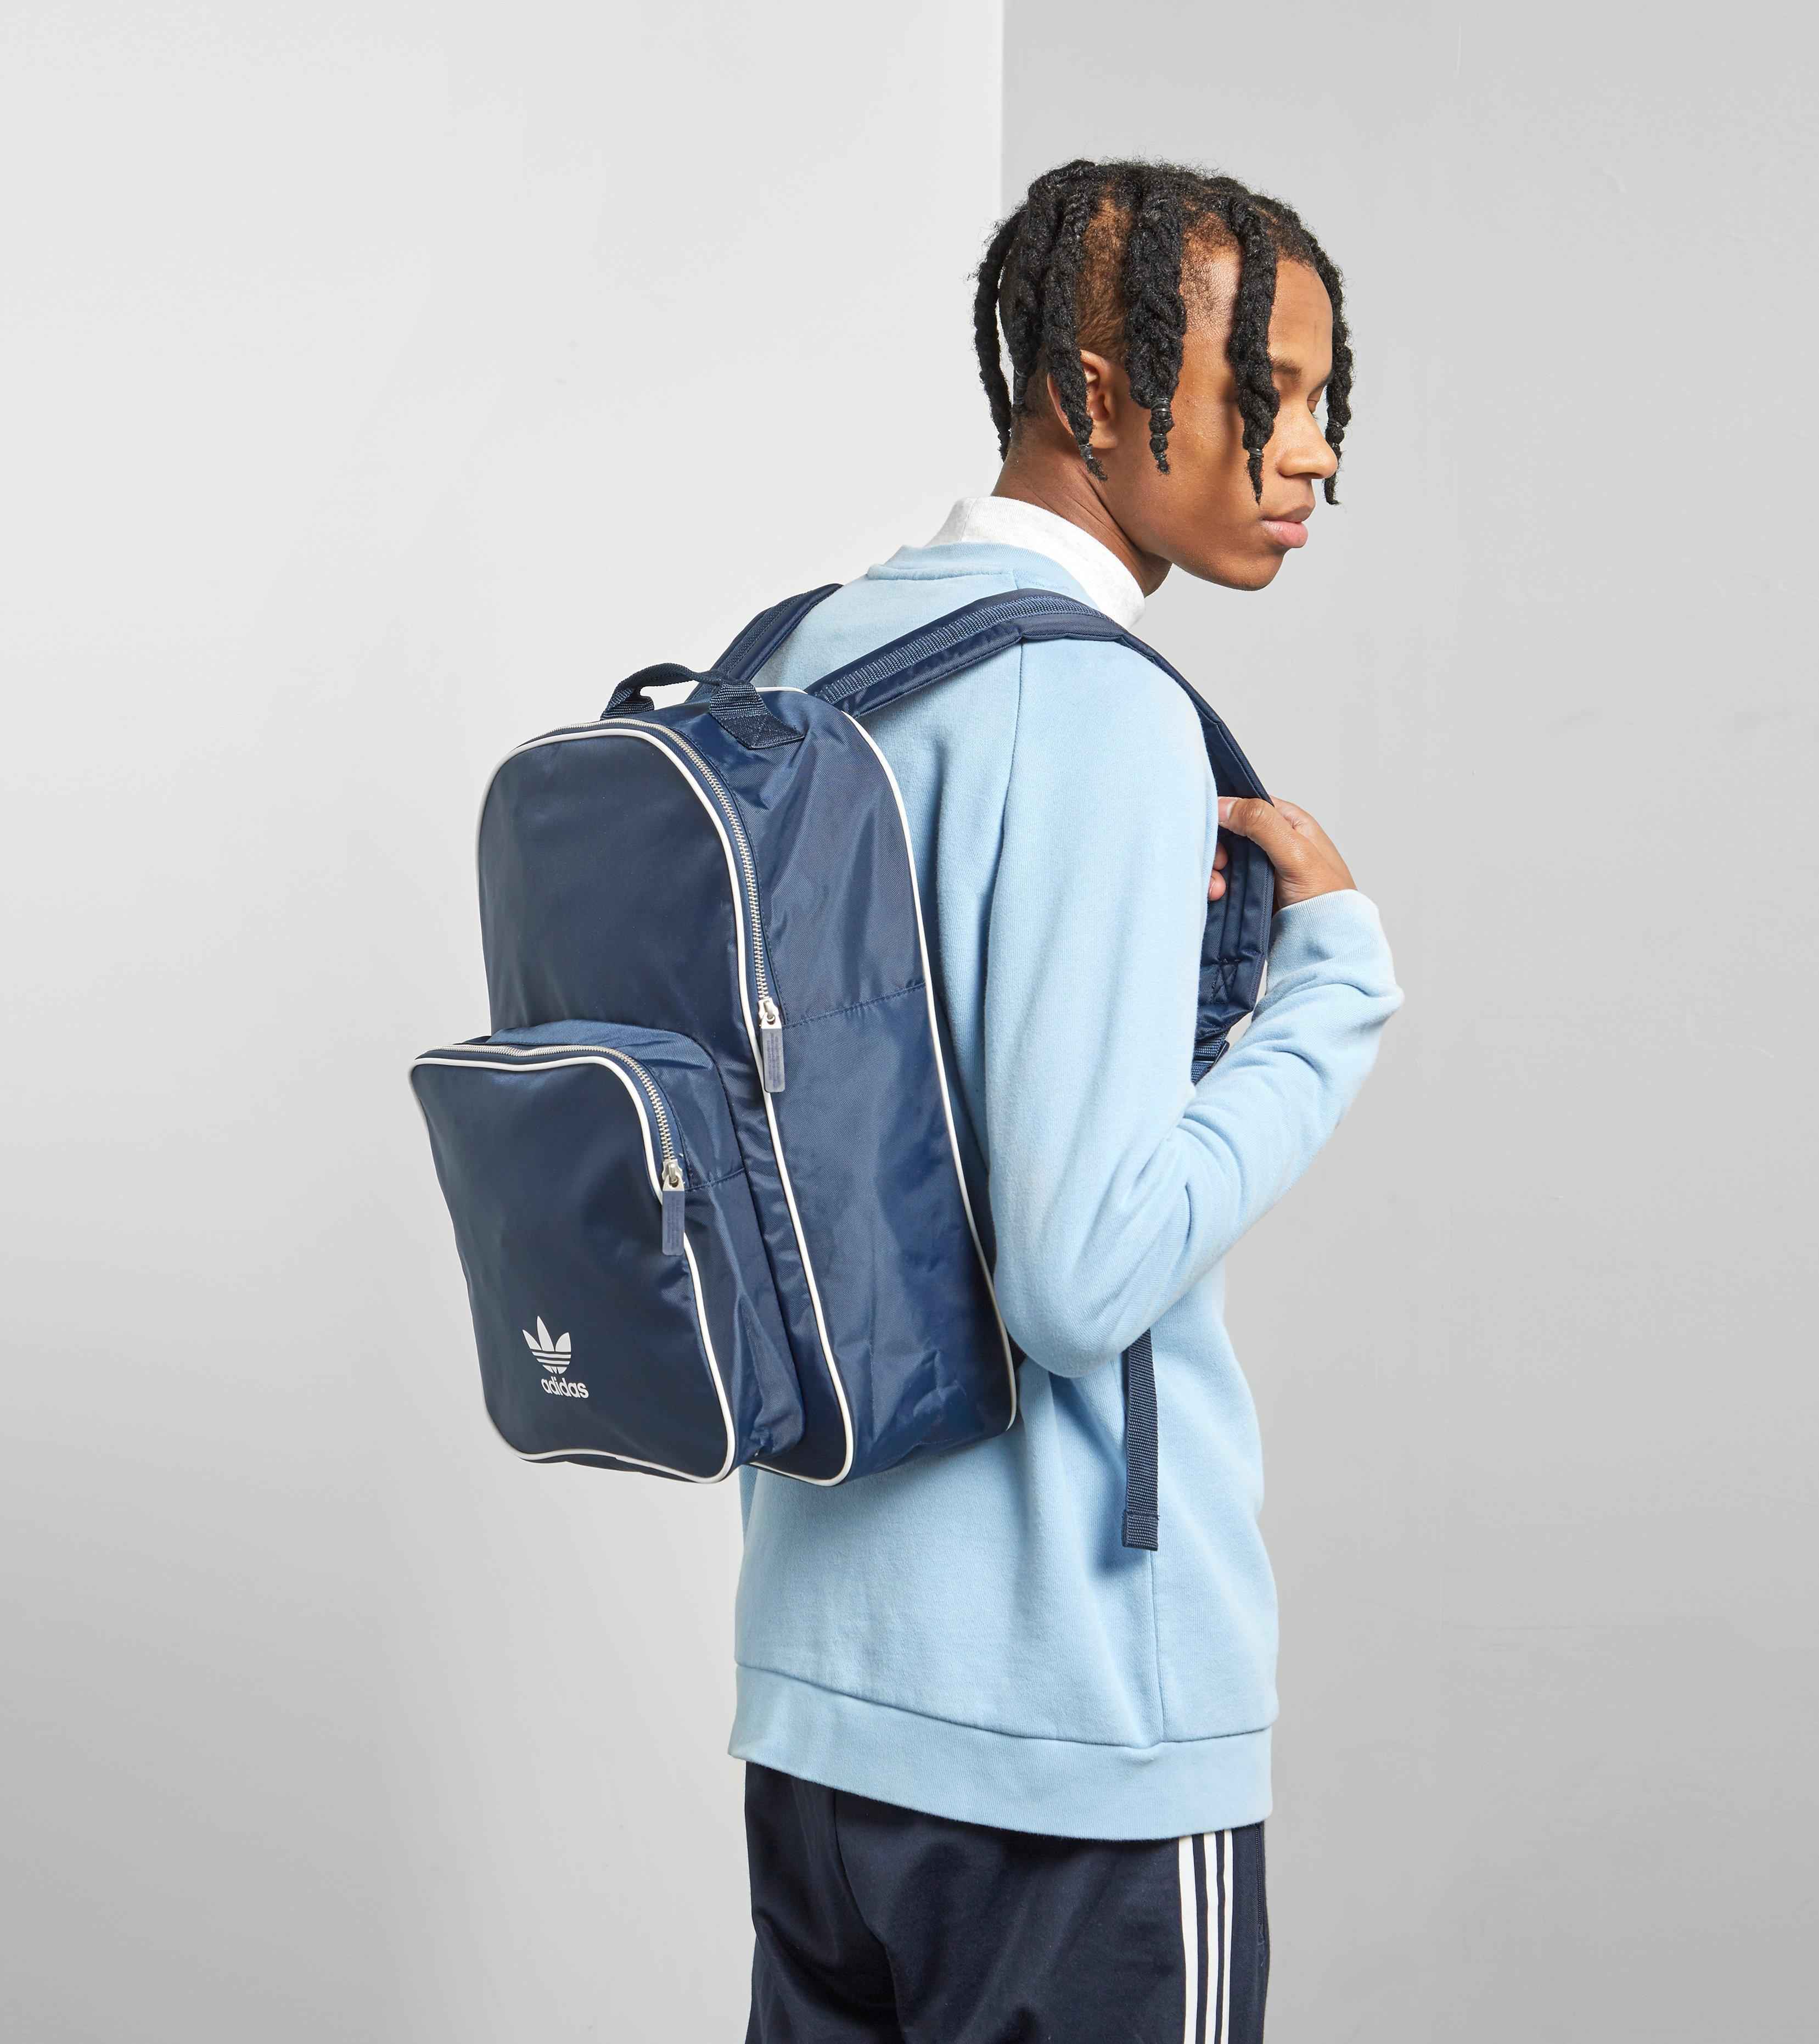 6e2195f598b adidas Originals Adicolor Backpack in Blue for Men - Lyst